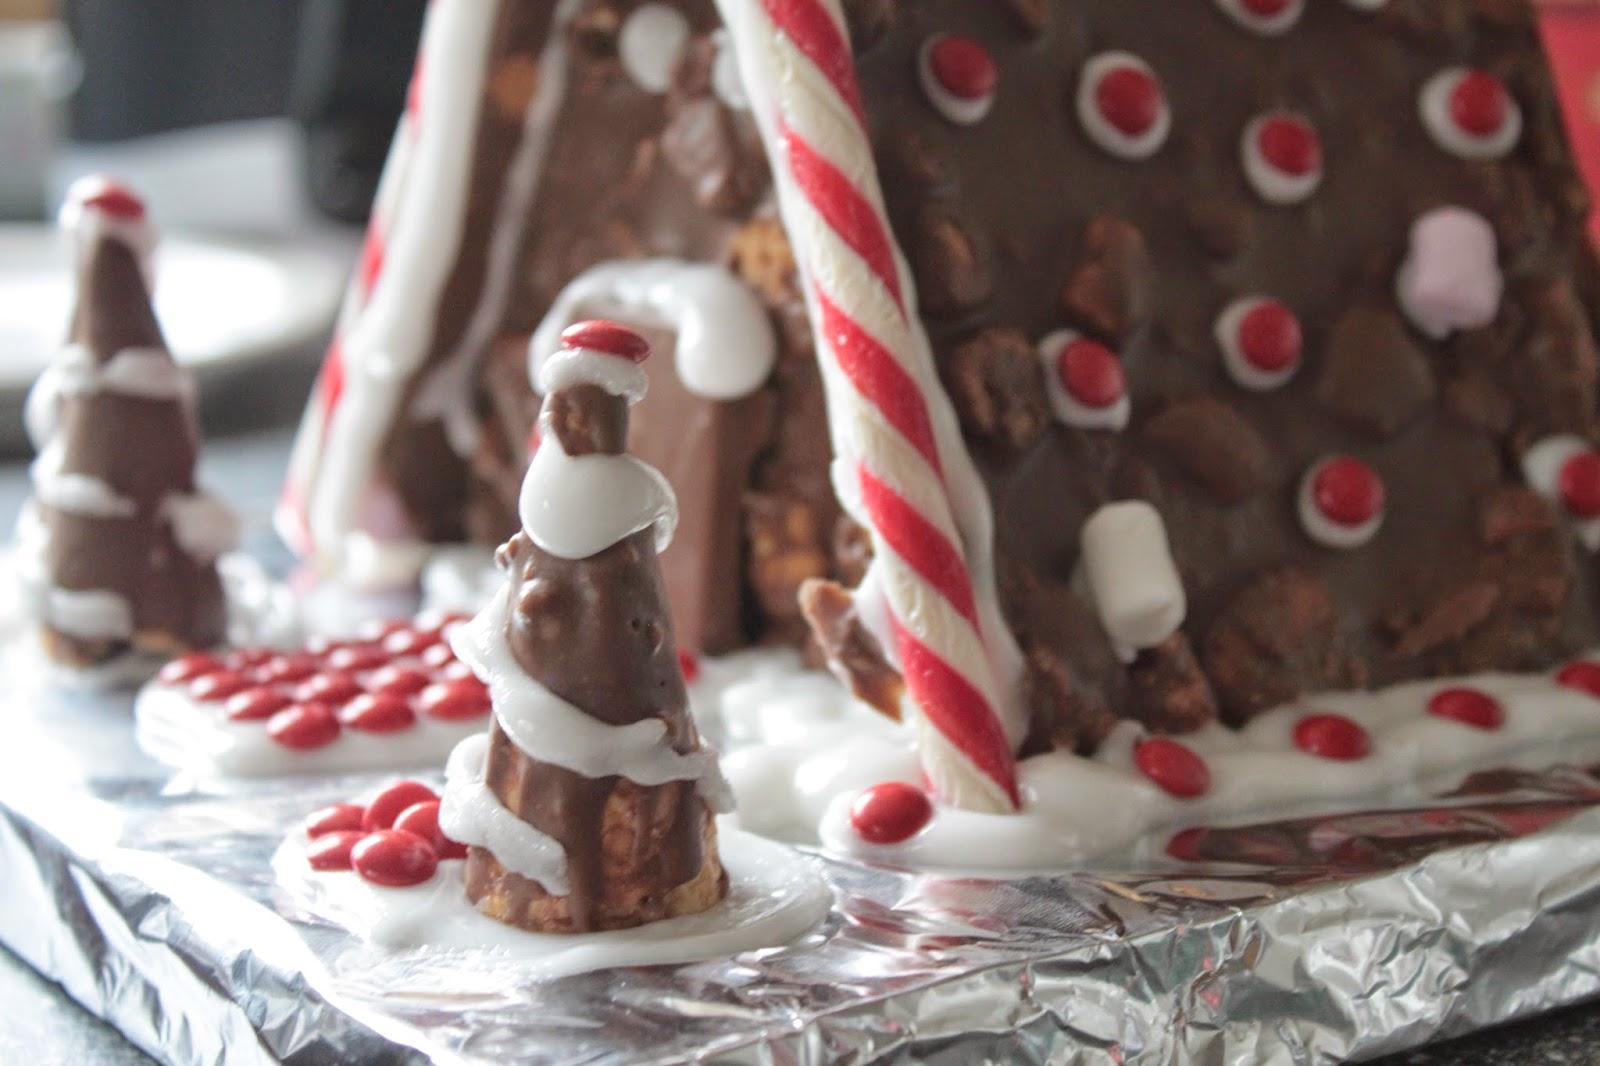 Given To Distracting Others Asda Christmas Baking Kits